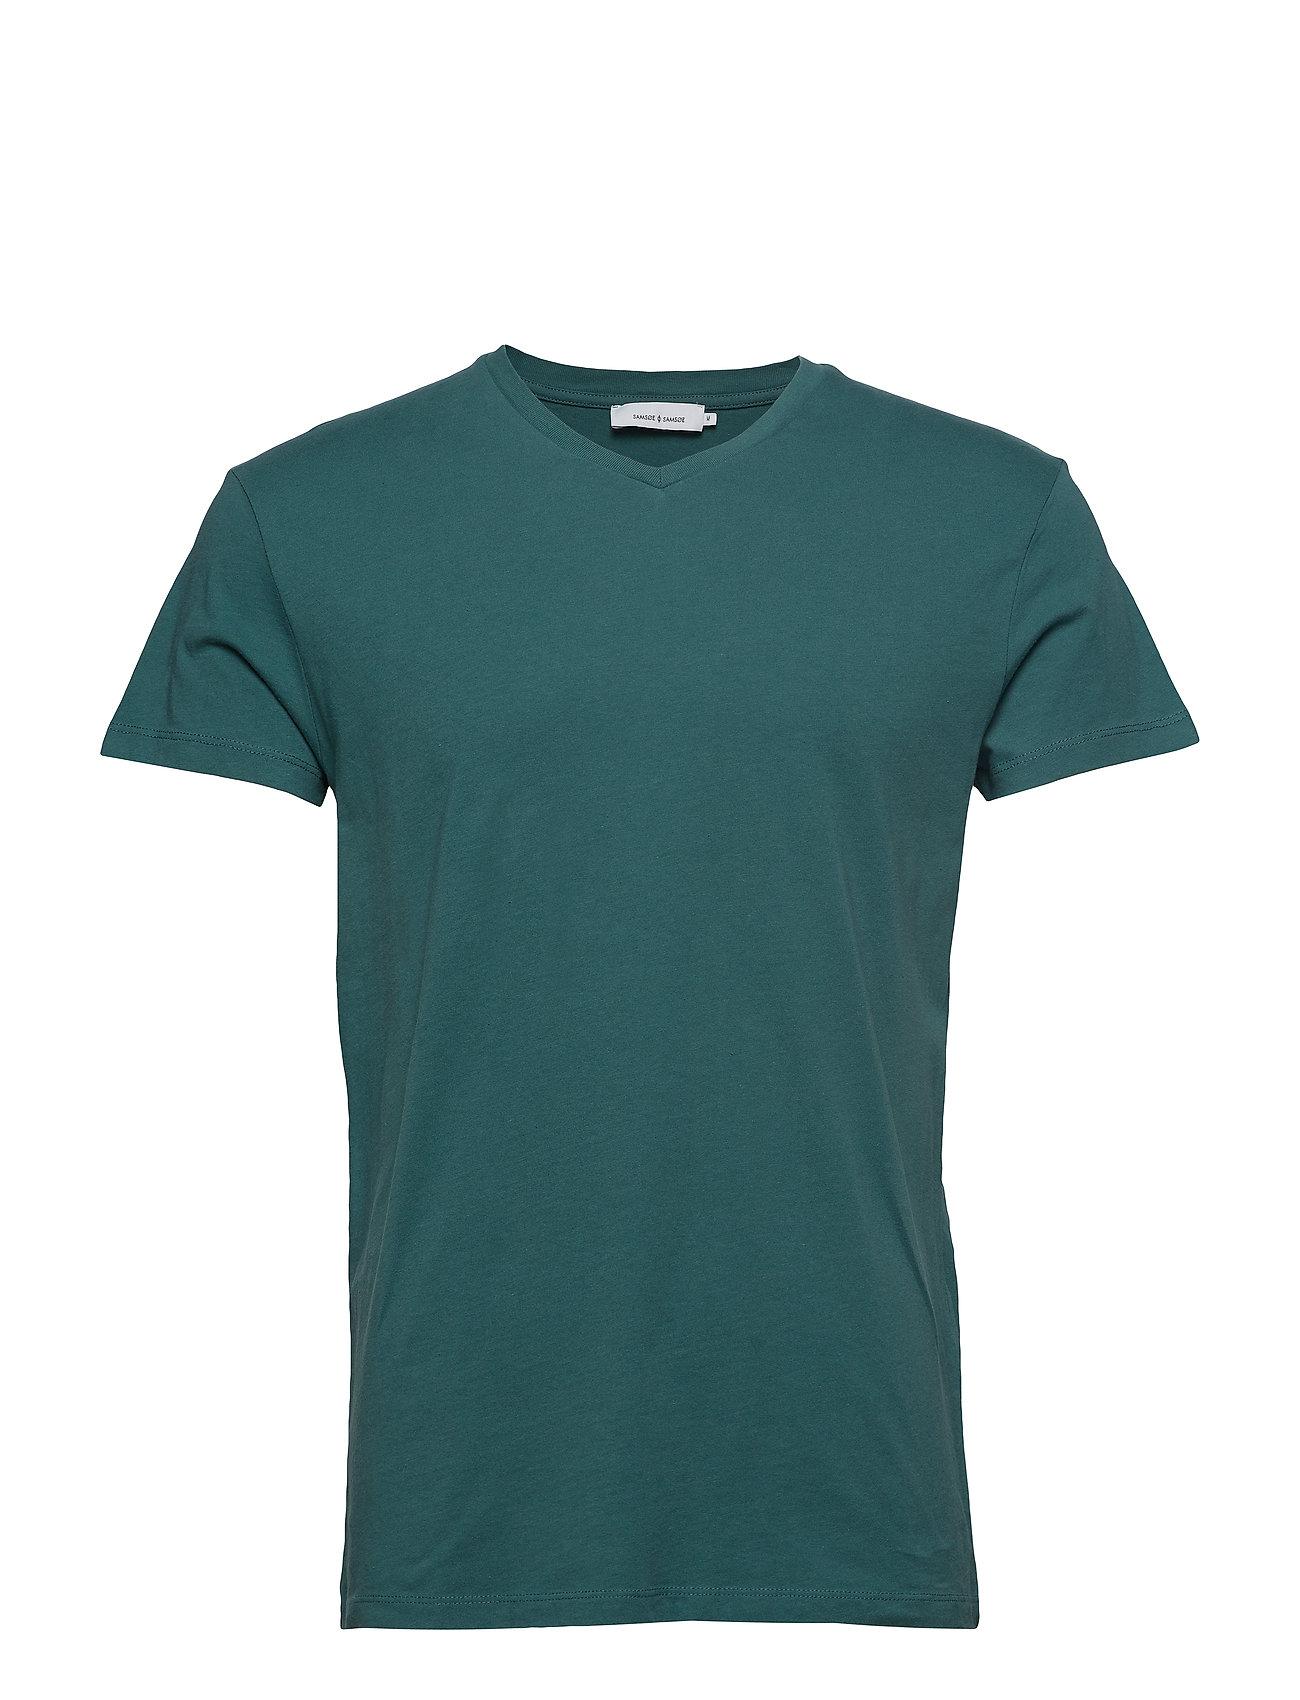 n T GreenSamsøeamp; 273mallard V Kronos shirt XiOPkZu